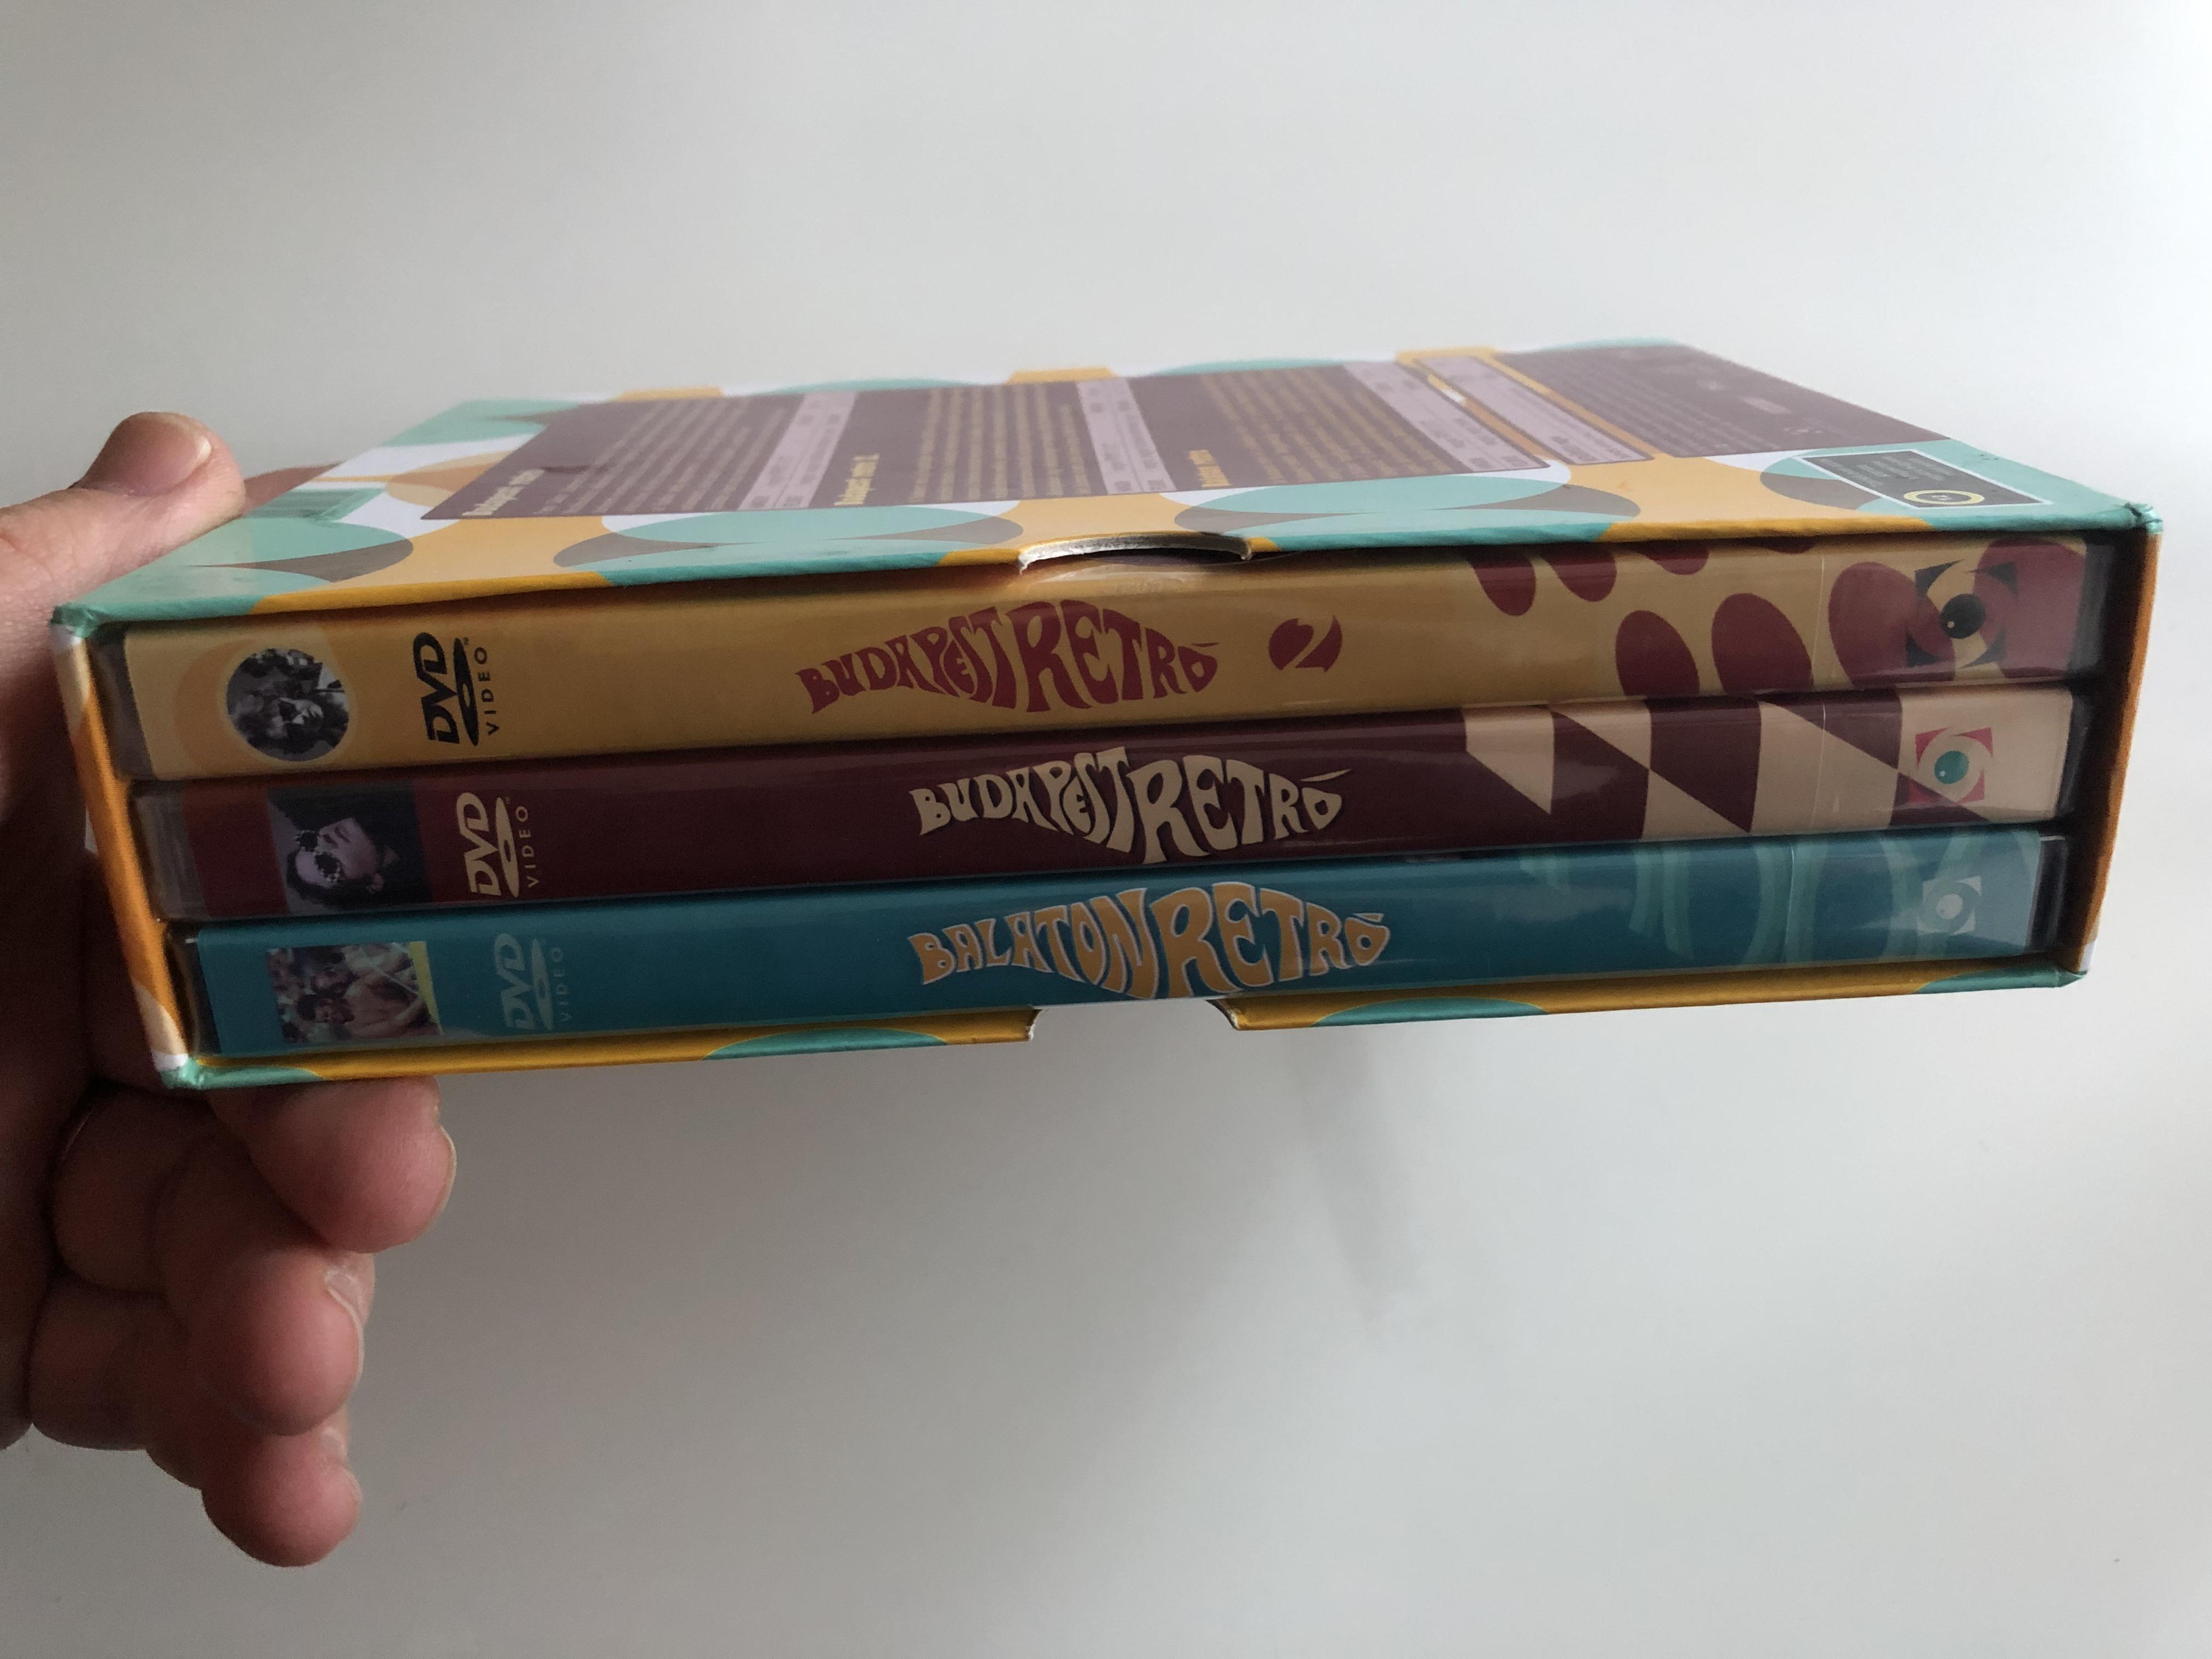 retr-d-szdoboz-dvd-box-papp-g-bor-zsigmond-retr-sorozata-2.jpg